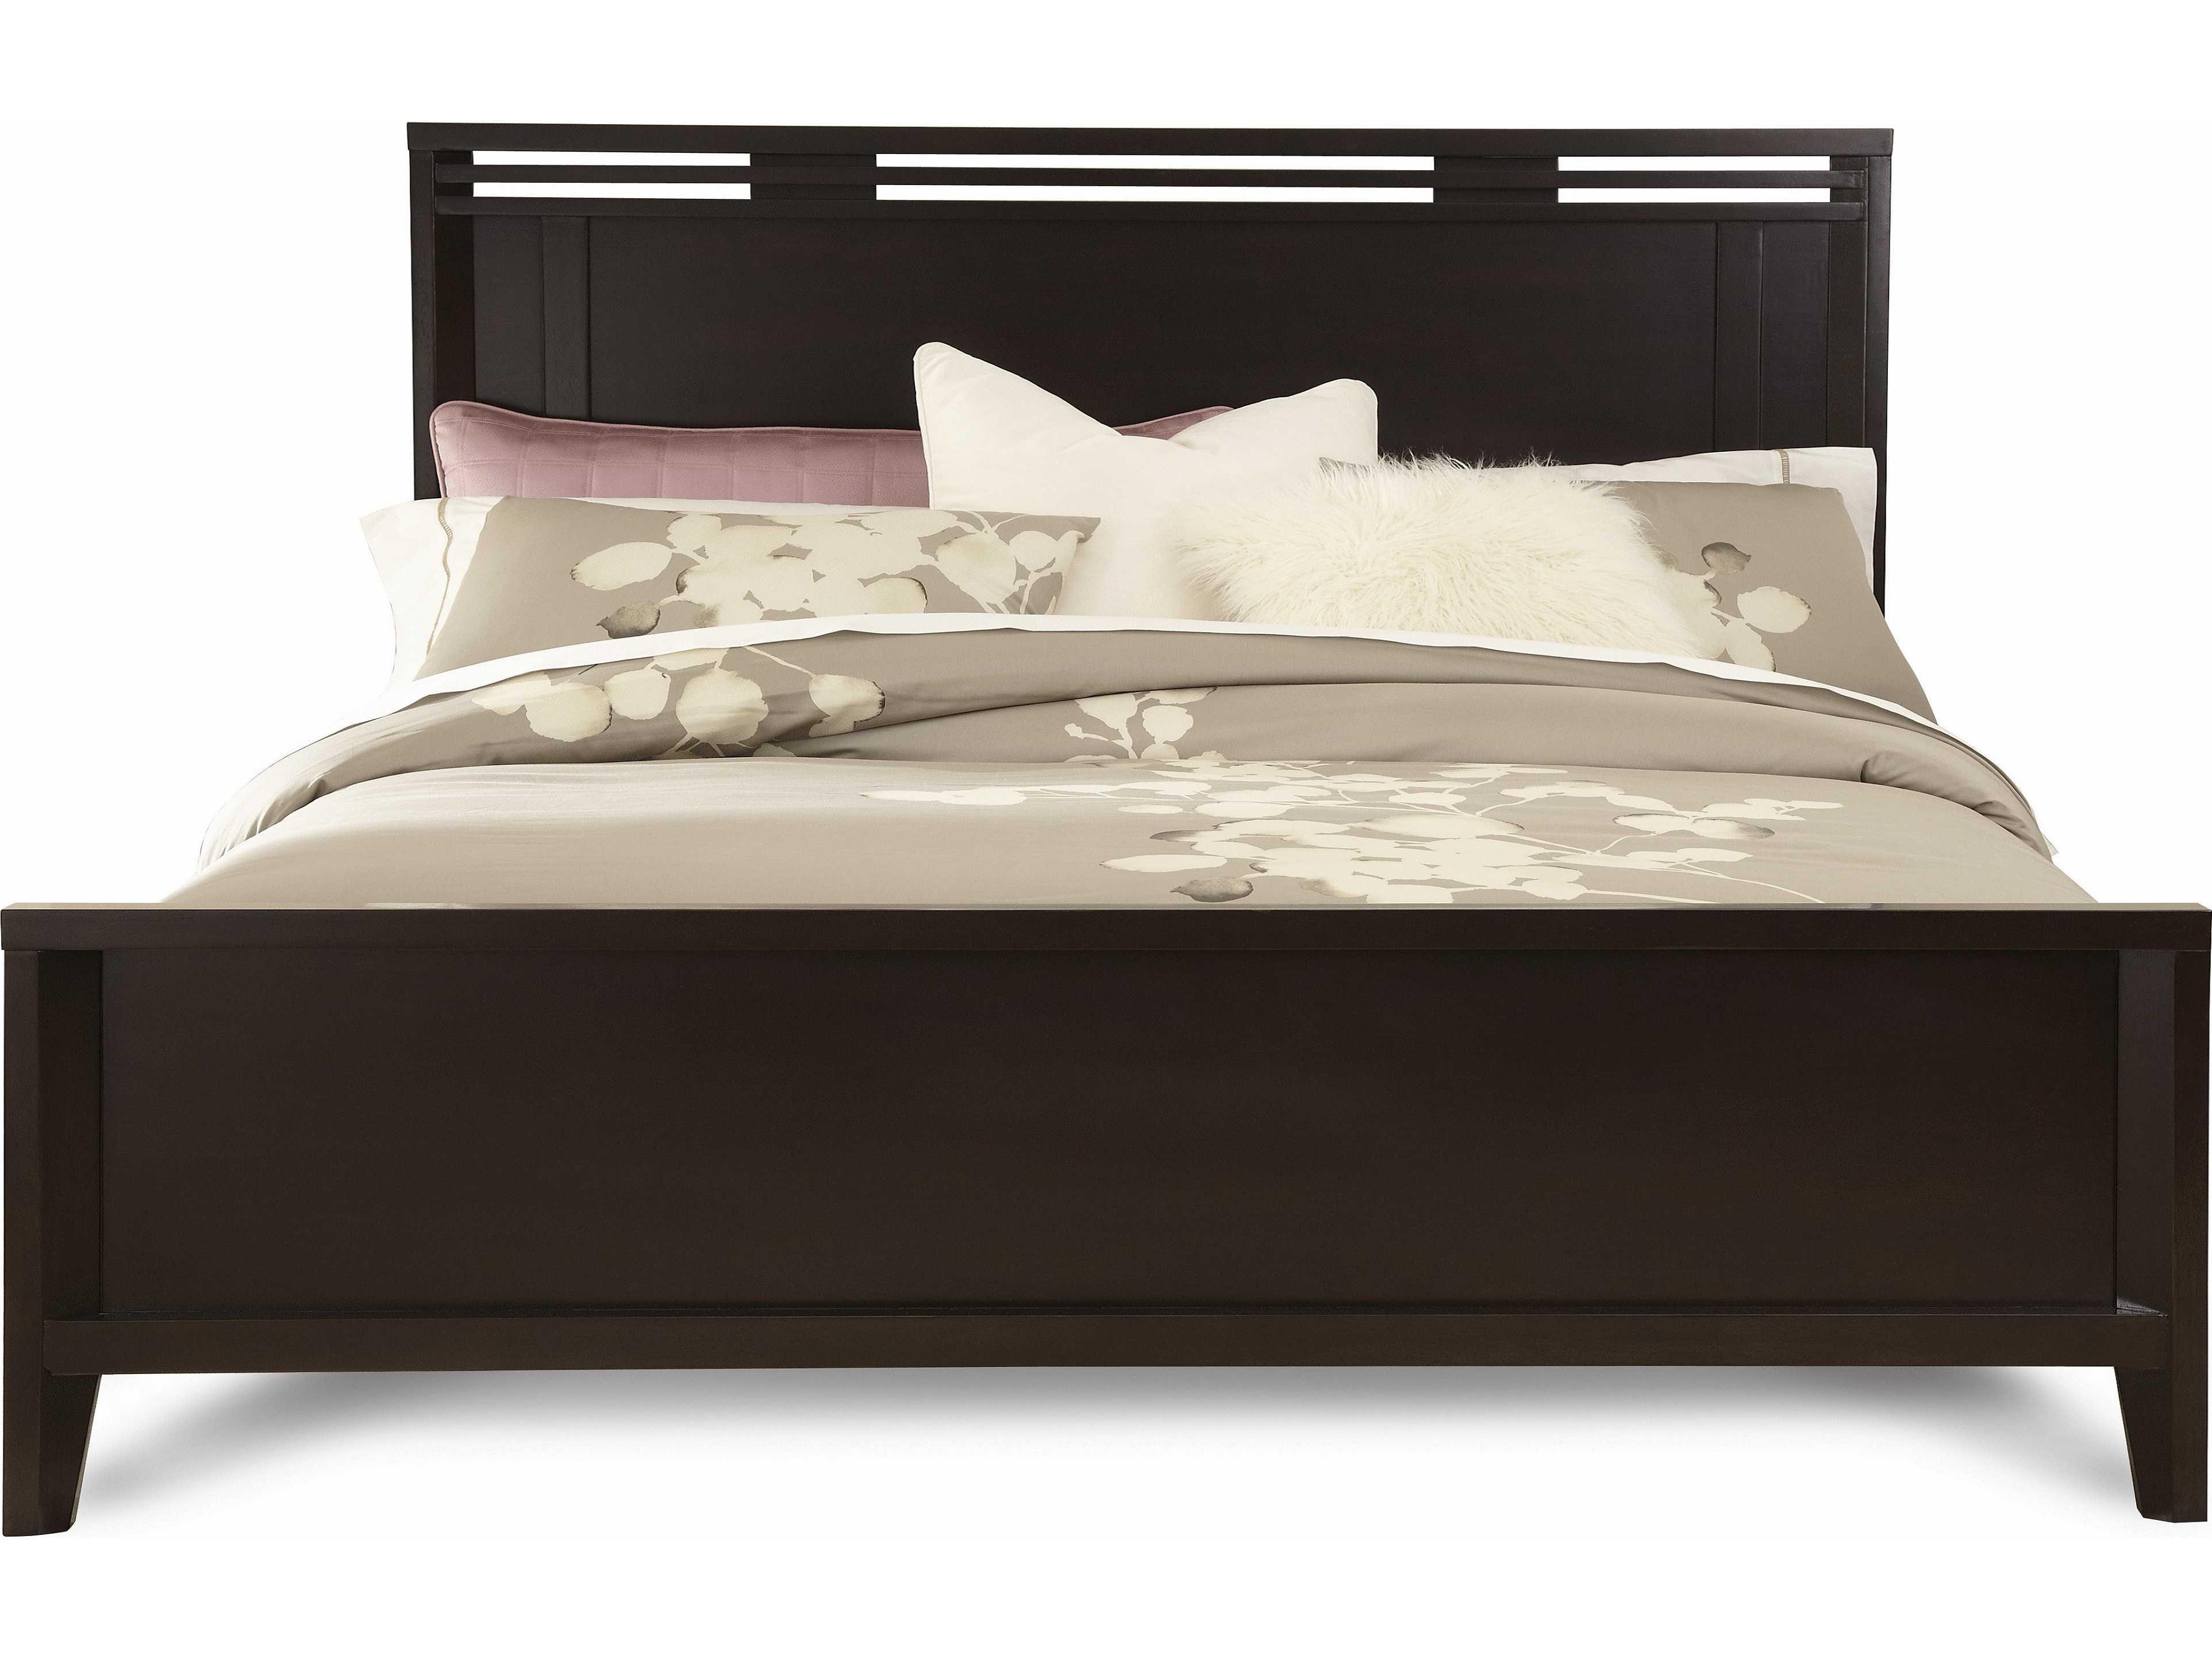 Casana Beckett Collection Dark Birch King Bed CX355951KK